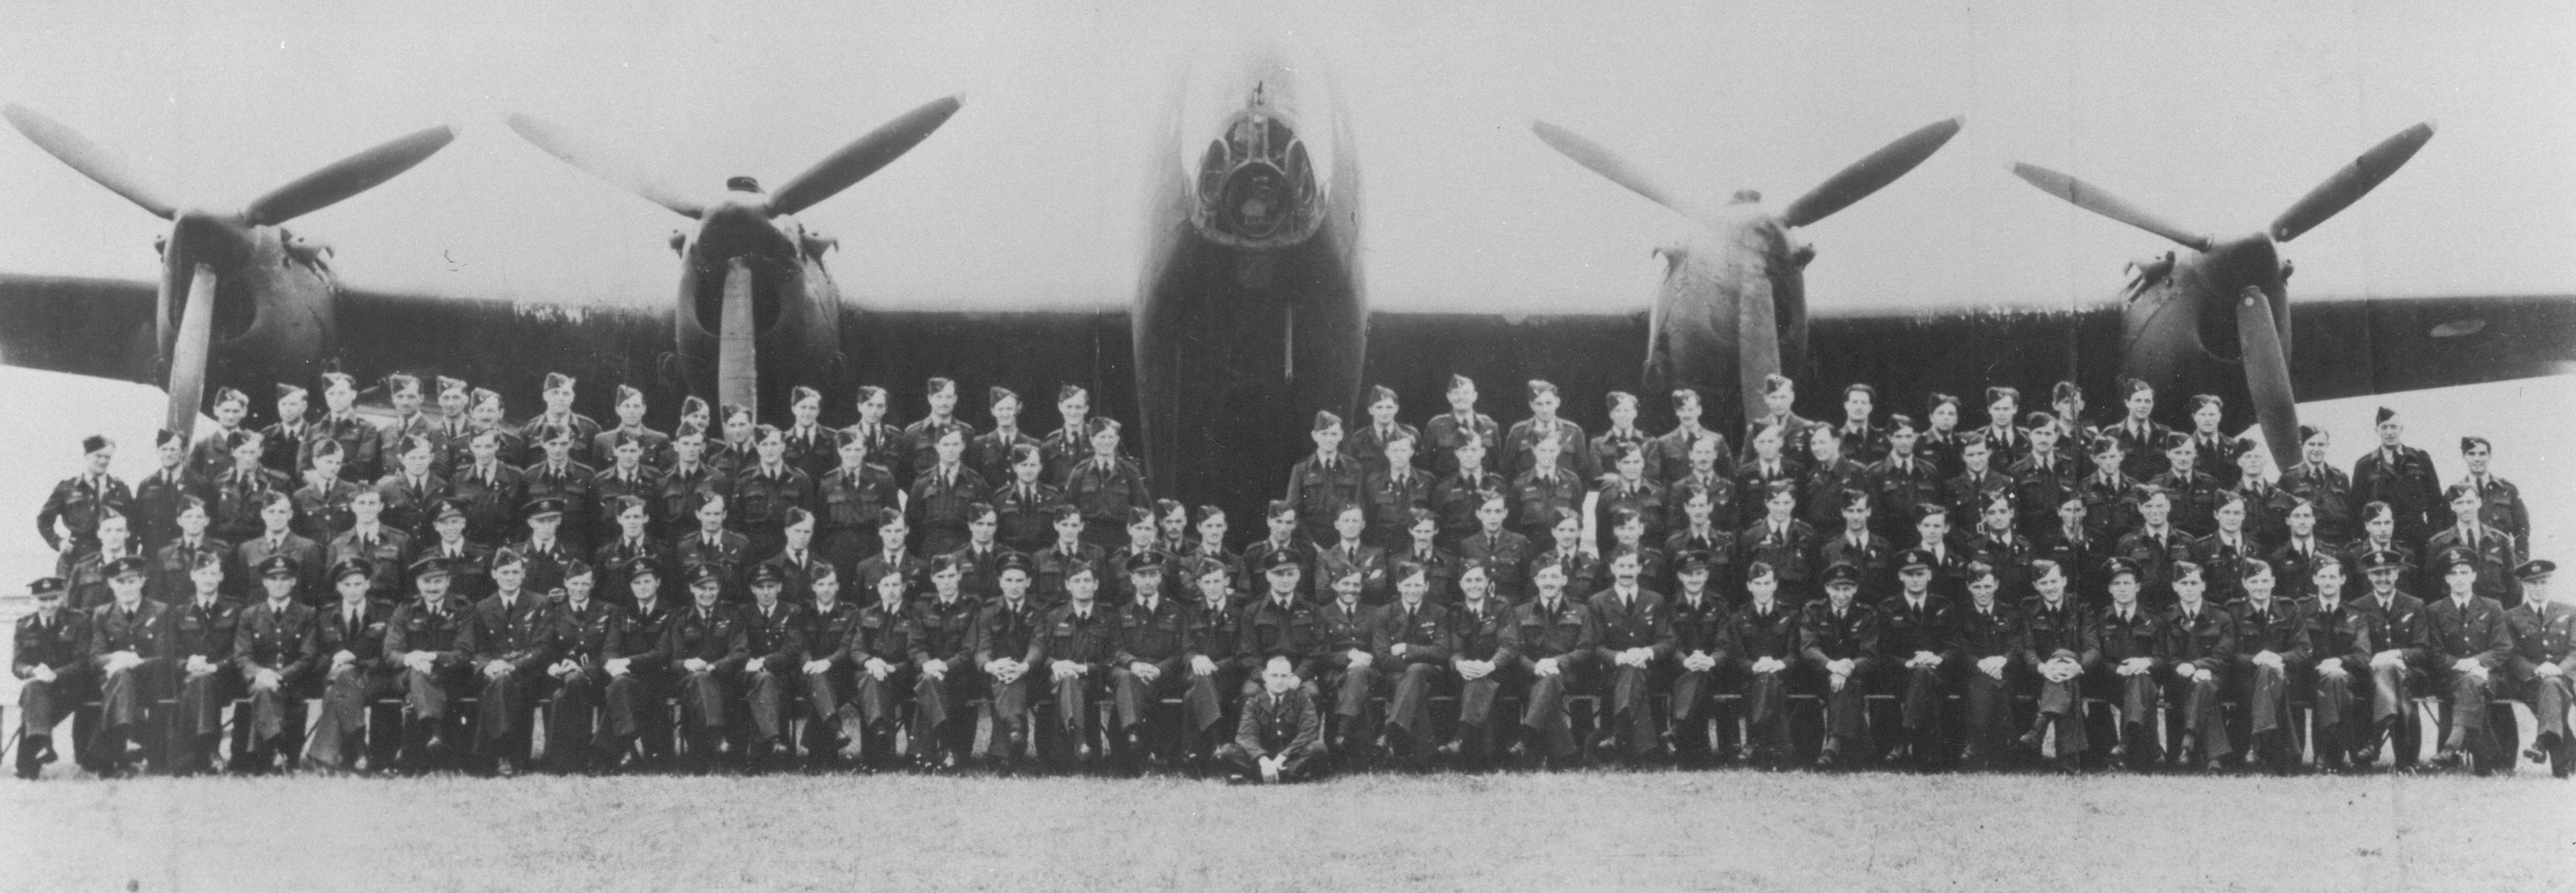 July 1943 [Colin Hewlett [Credit - Friends of the Pathfinders]].jpg